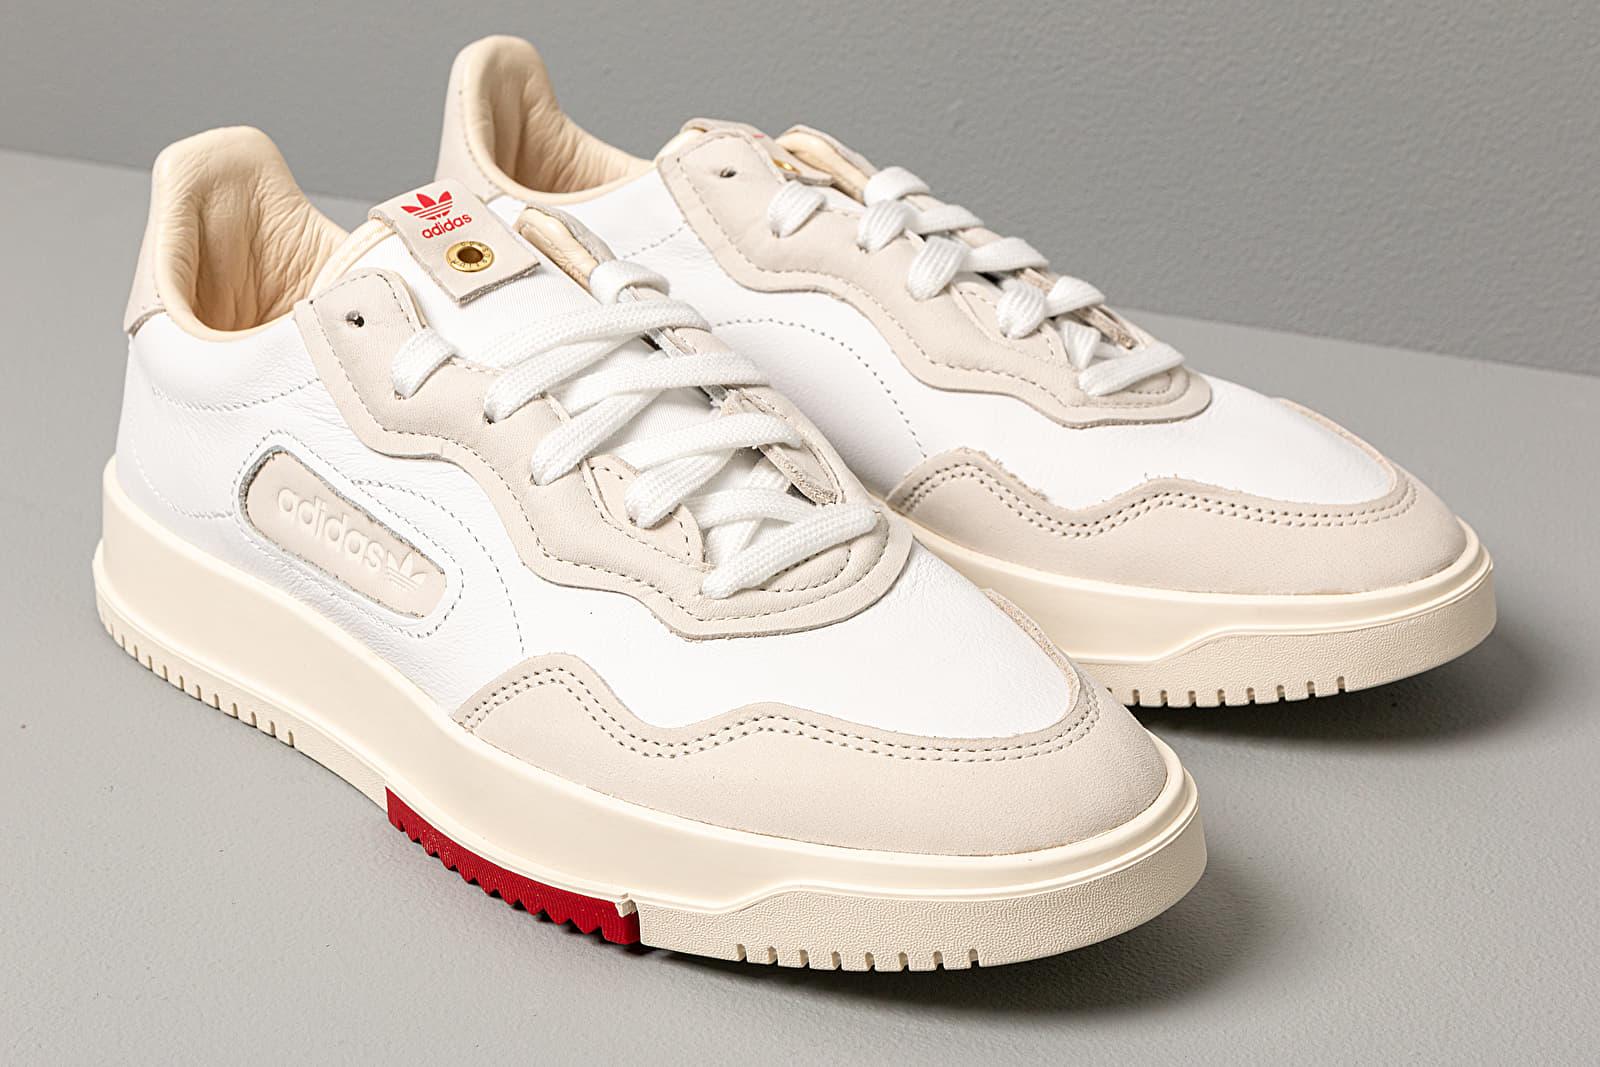 Men's shoes adidas Consortium x The